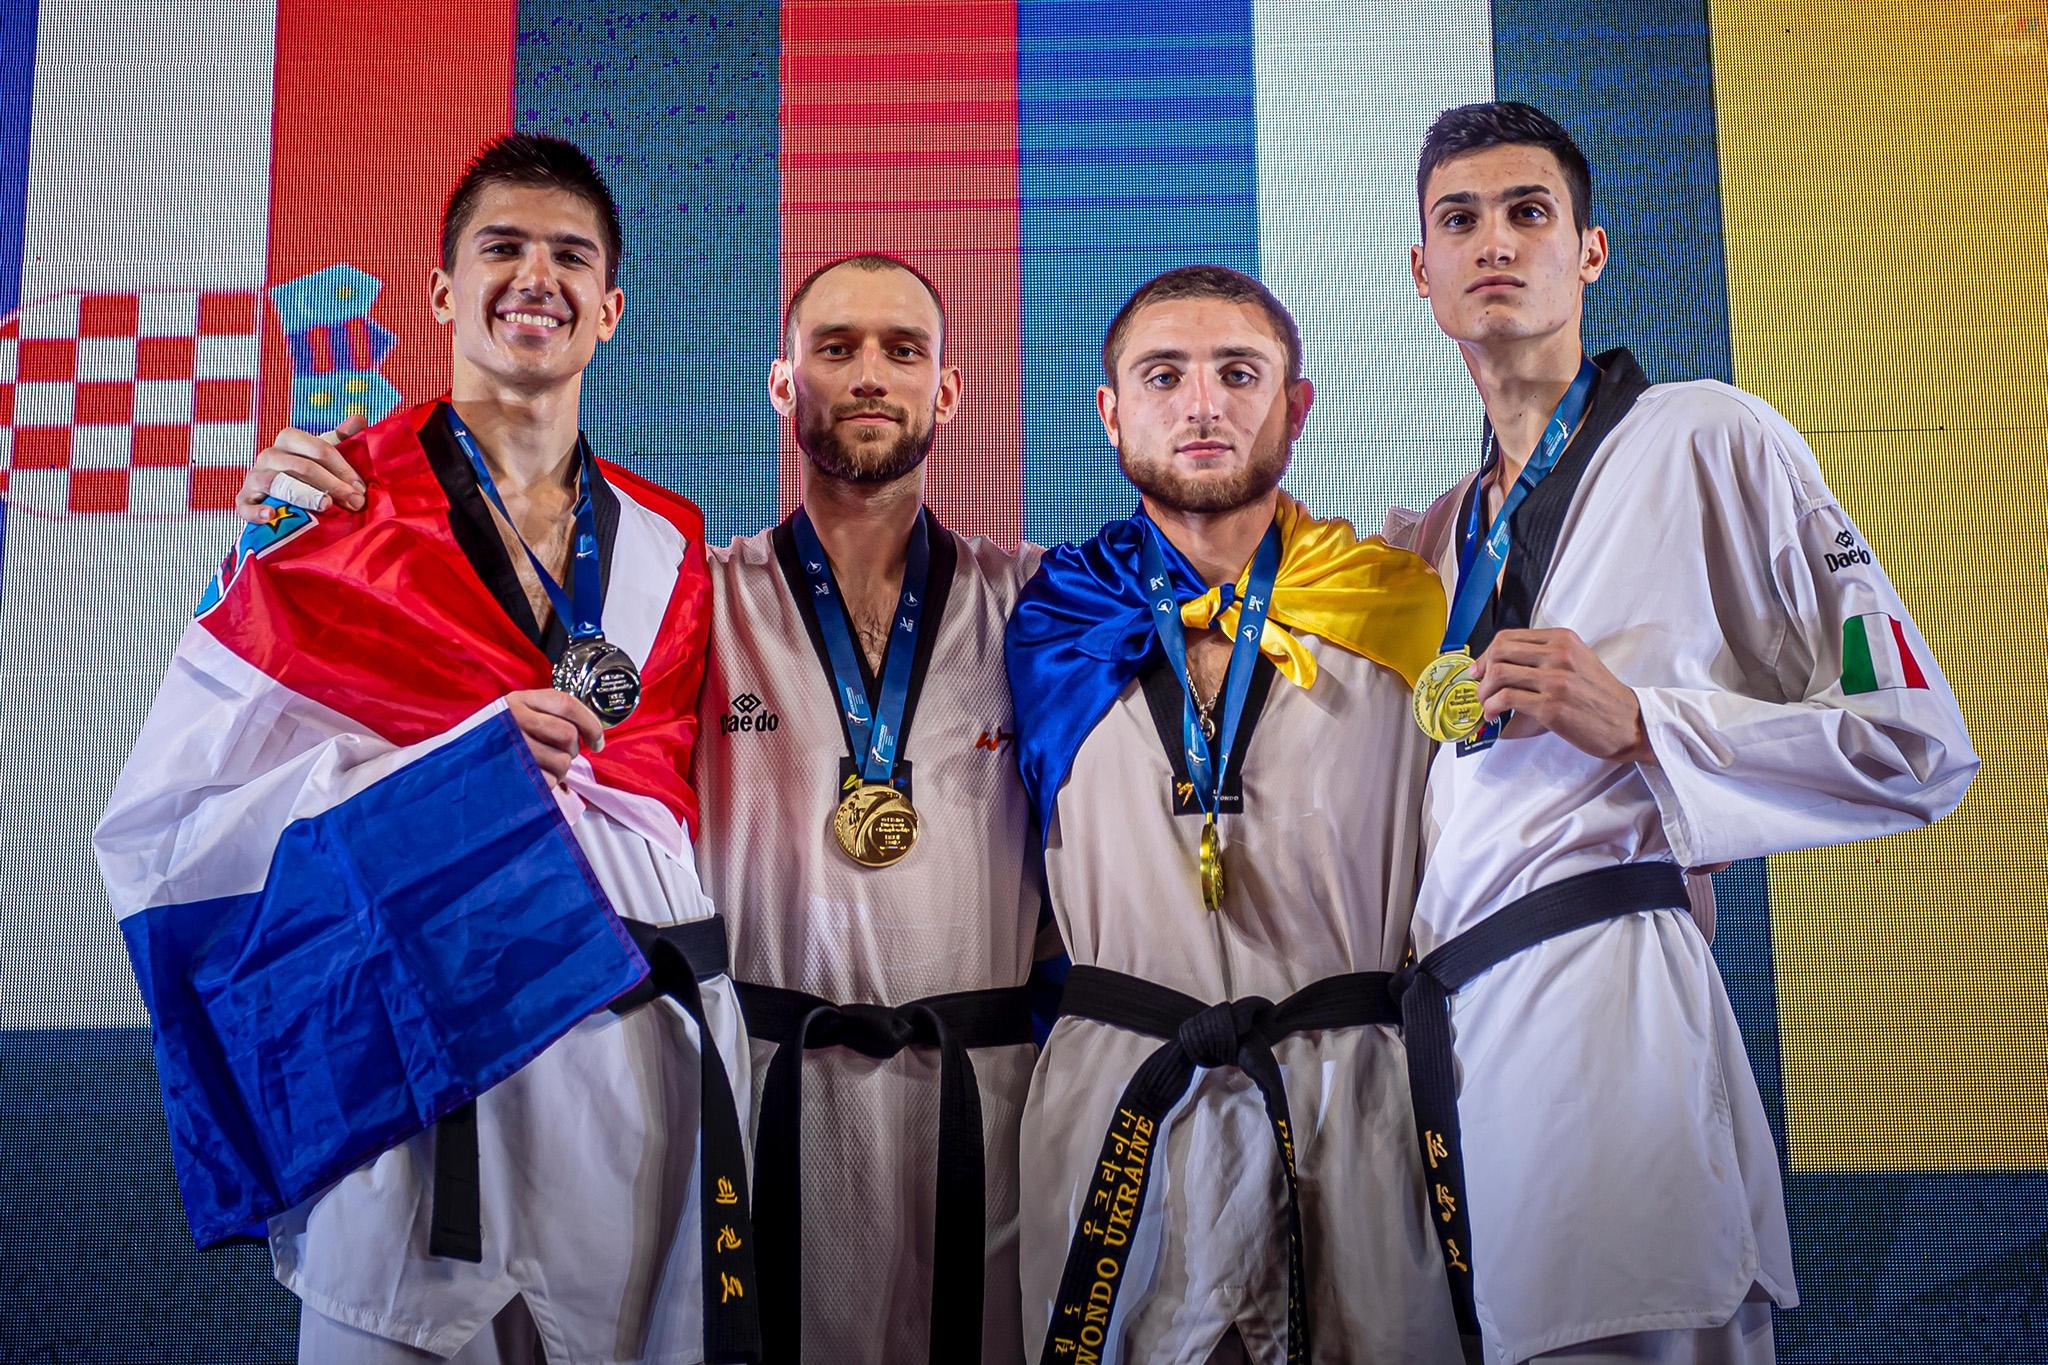 1572793024_male-80a_g4-extra-european-taekwondo-championships-bari-2019